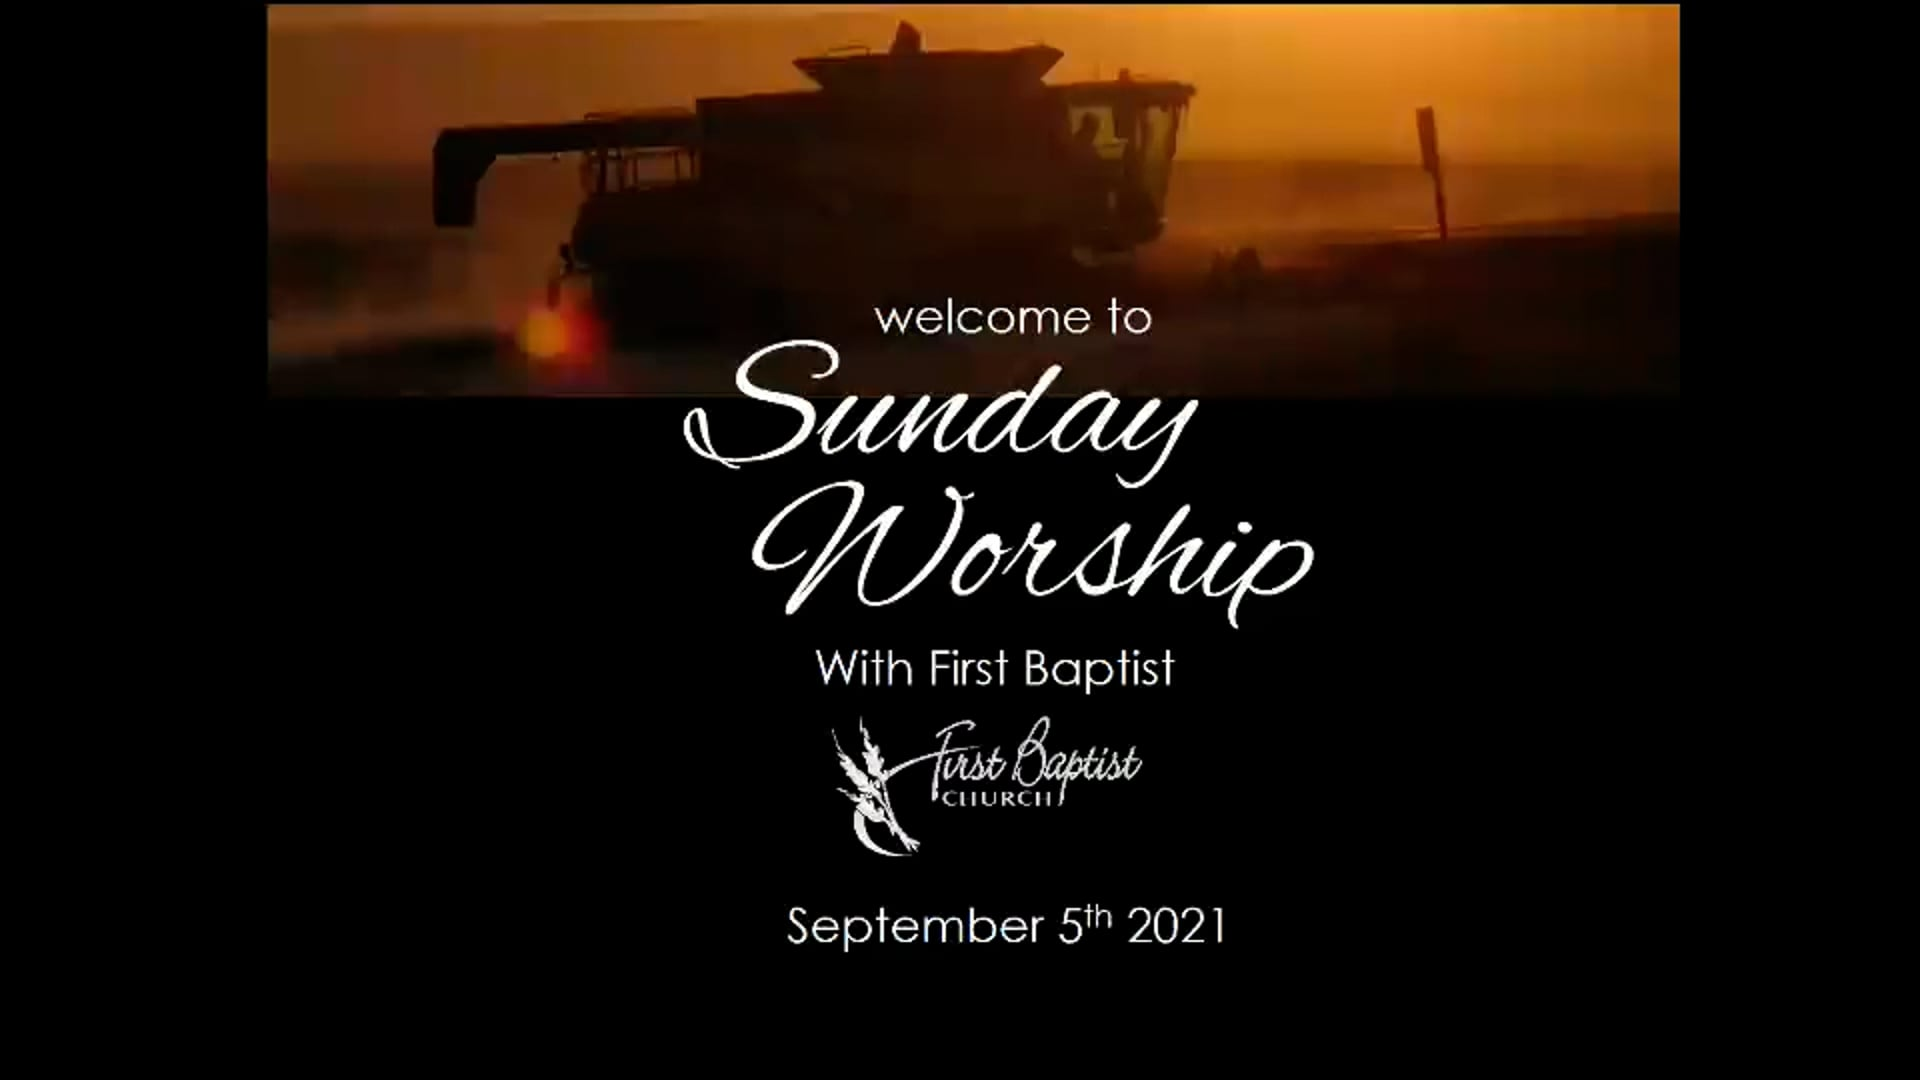 September 5, 2021 Worship Service